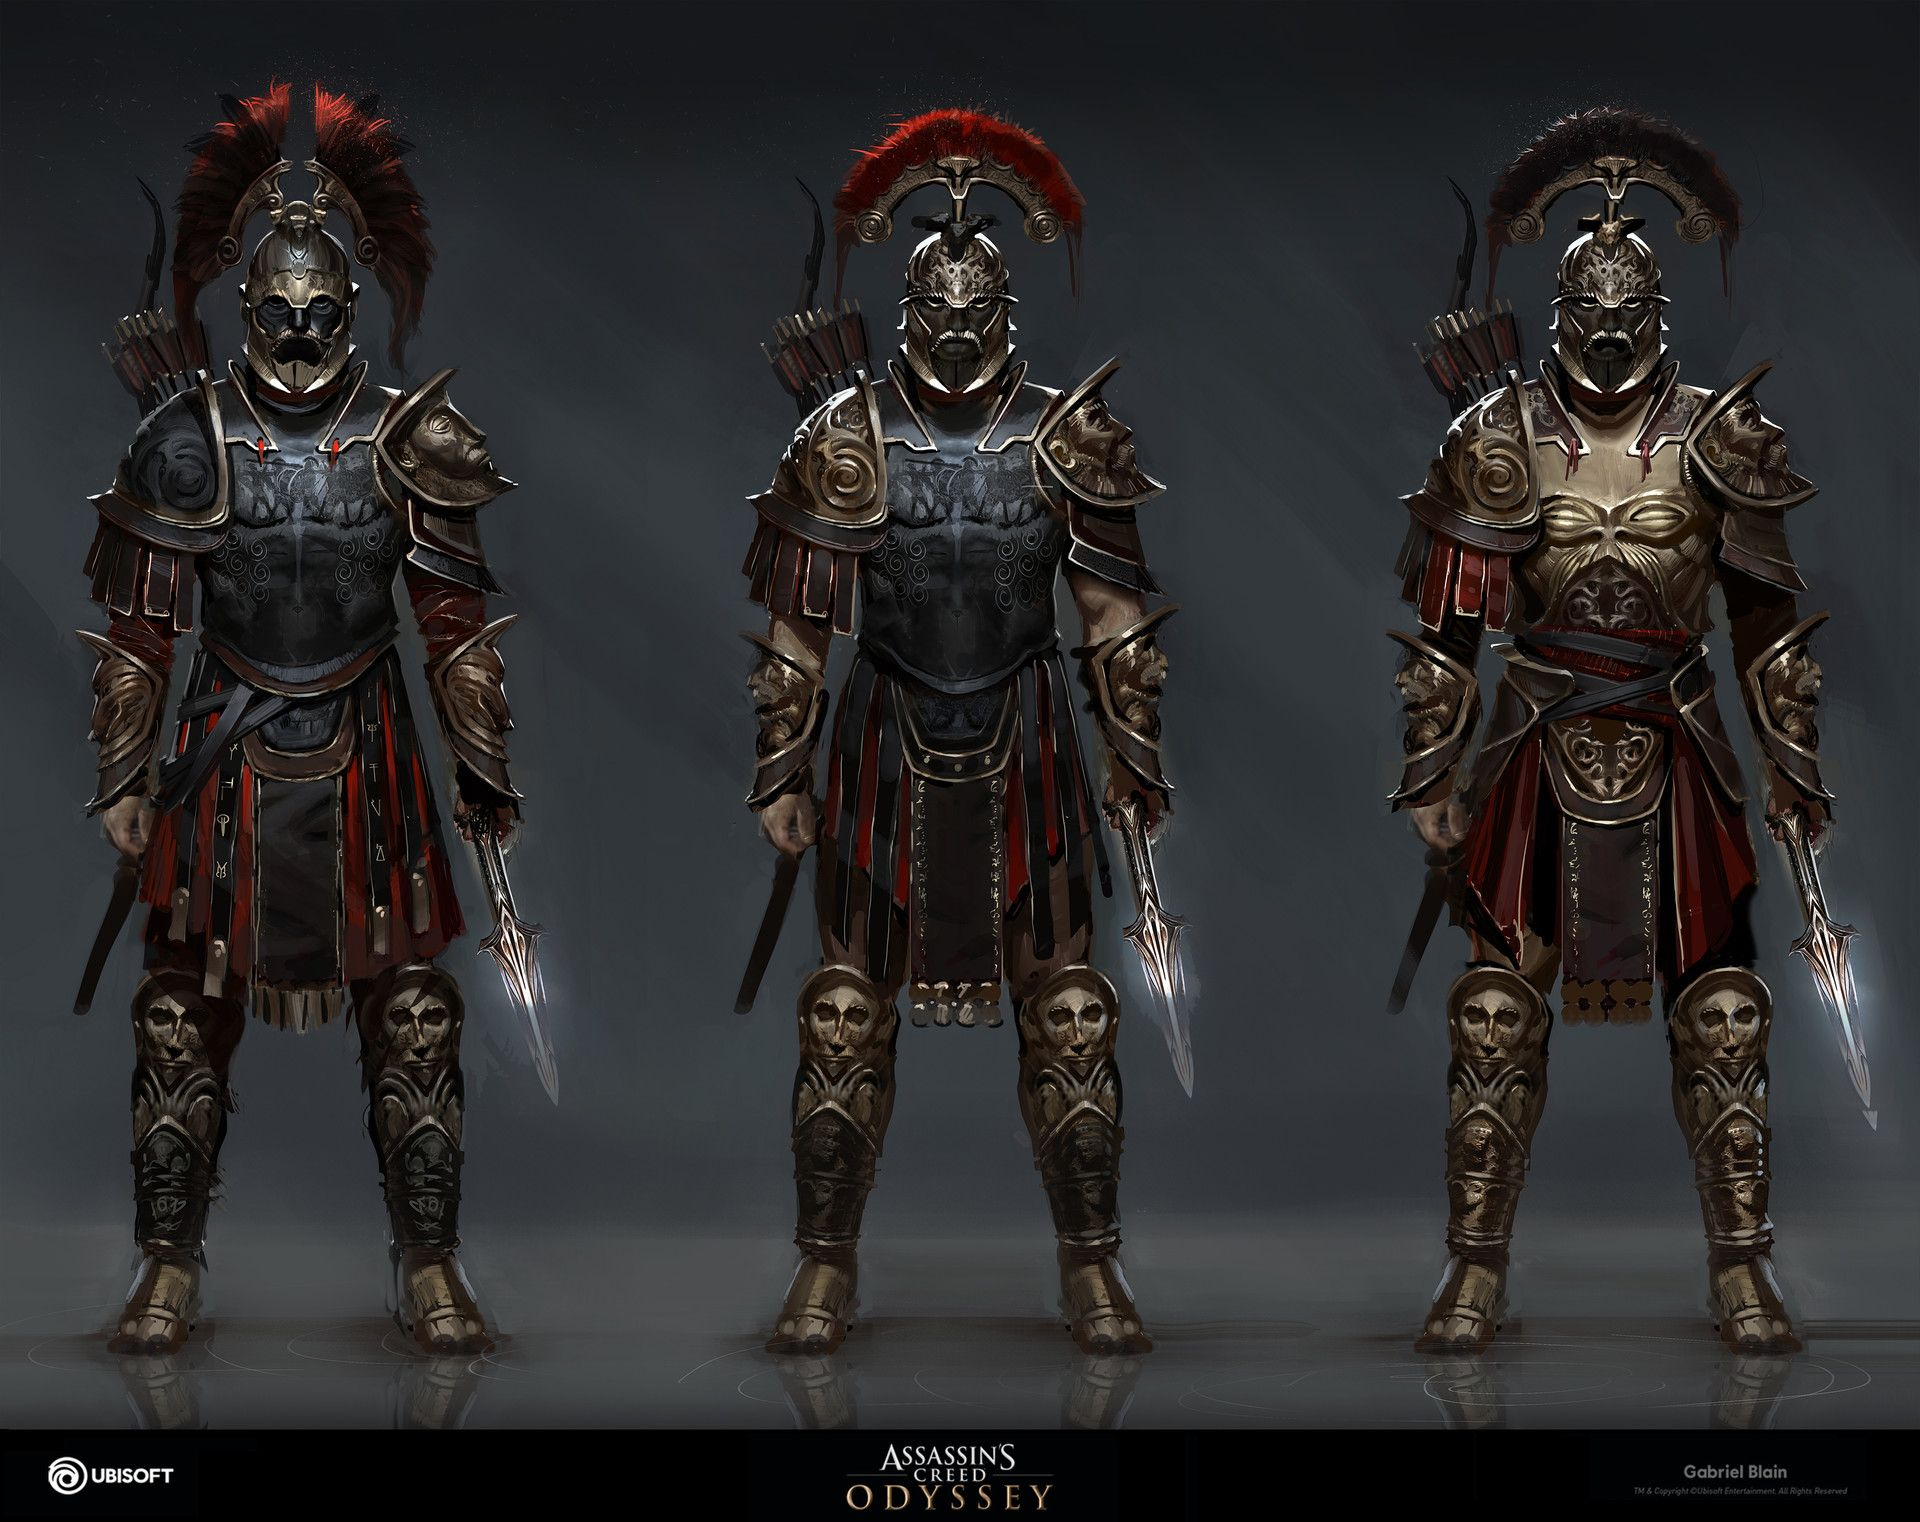 assassins creed odyssey assassins armor - HD1920×1522